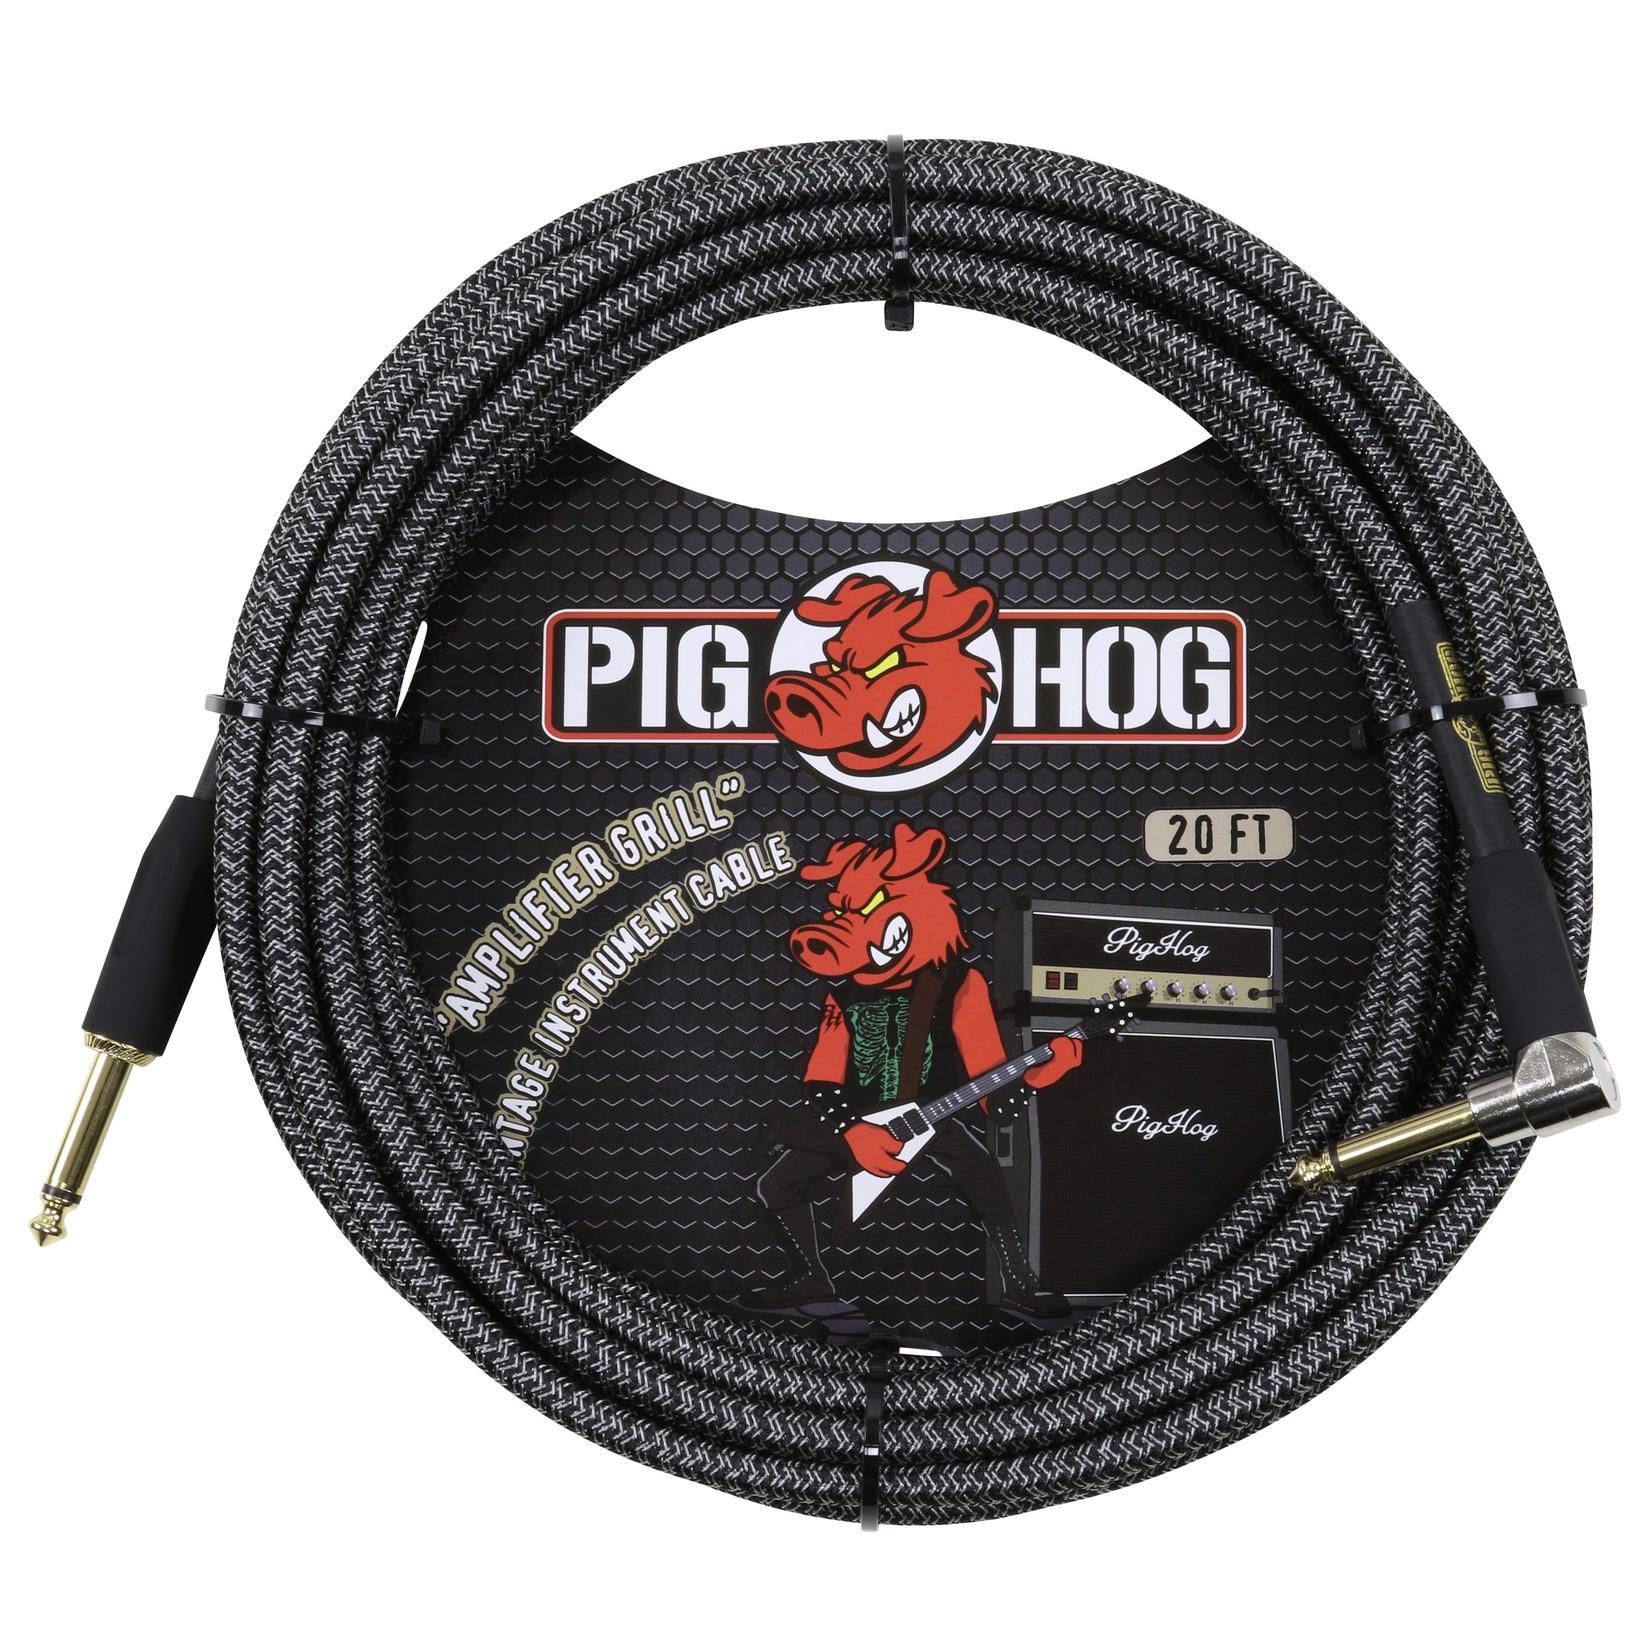 "Pig Hog Pig Hog ""Amplifier Grill"" (Black/Silver) Vintage Woven 20-ft Instrument Cable, 1/4""-1/4"" Rt Angle"